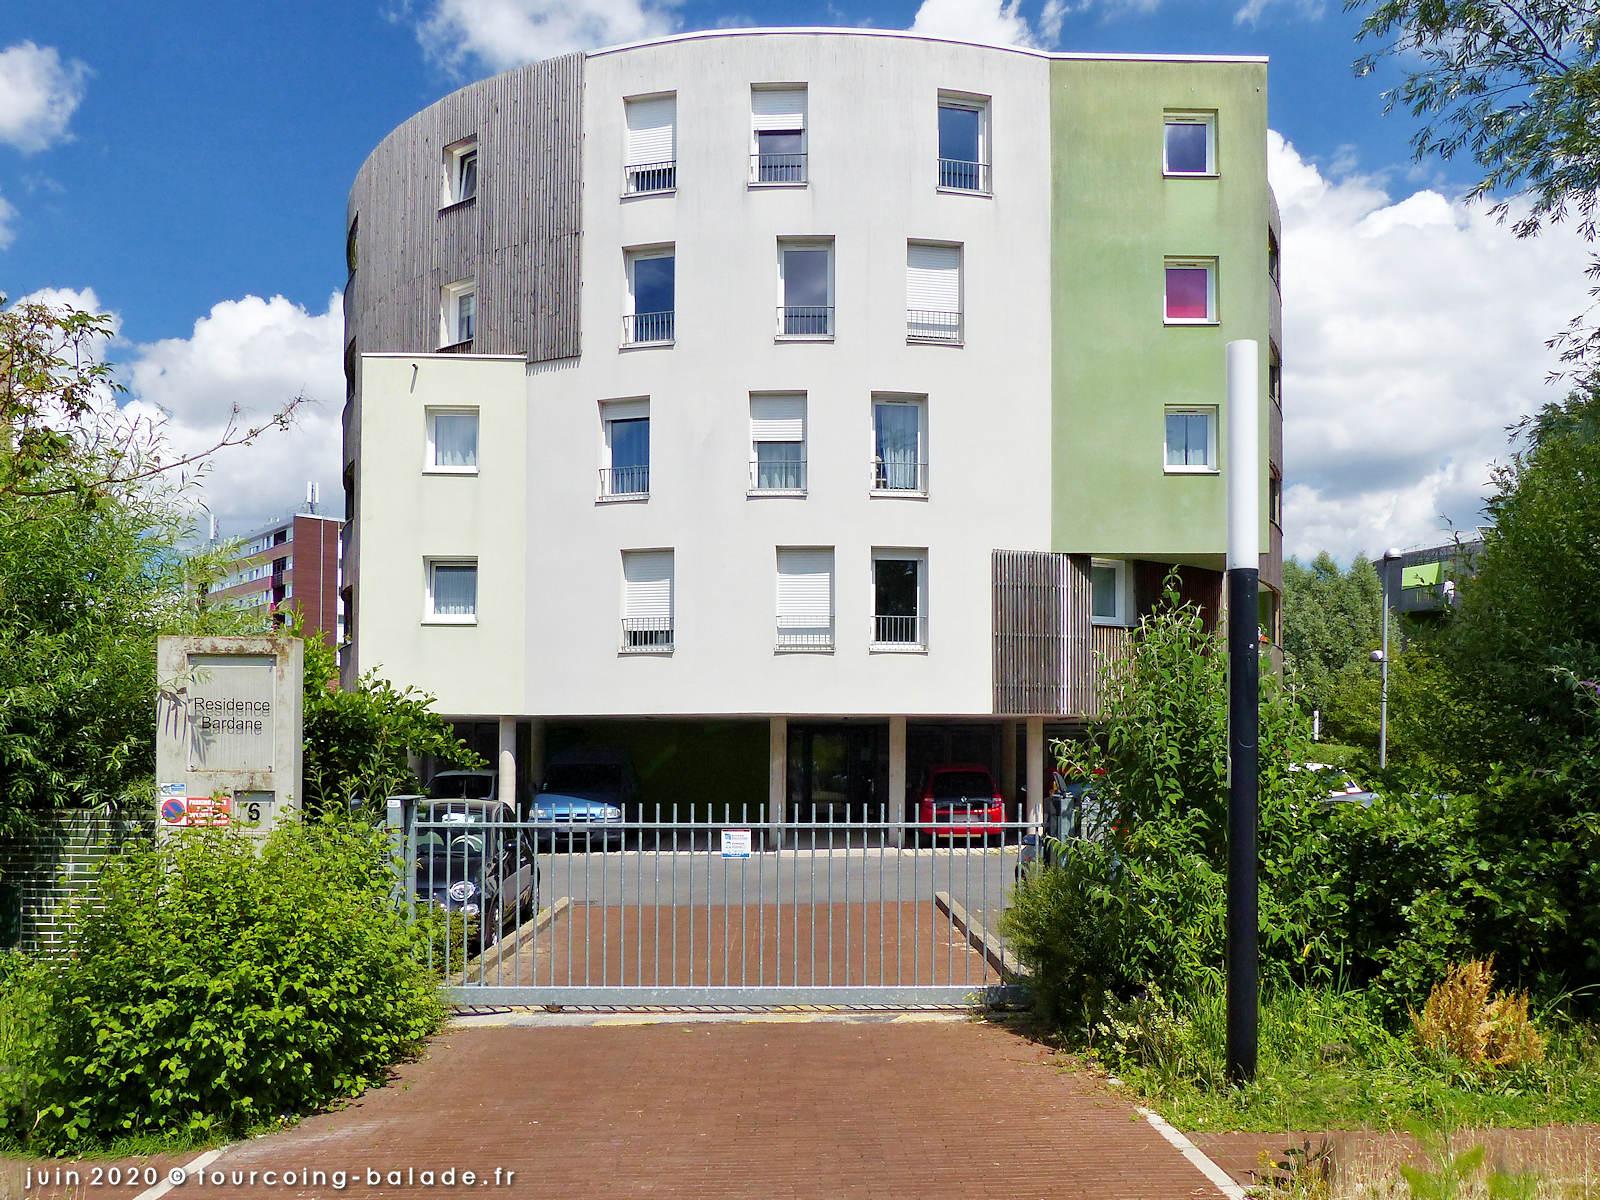 Résidence Barbane, Tourcoing Belencontre, 2020